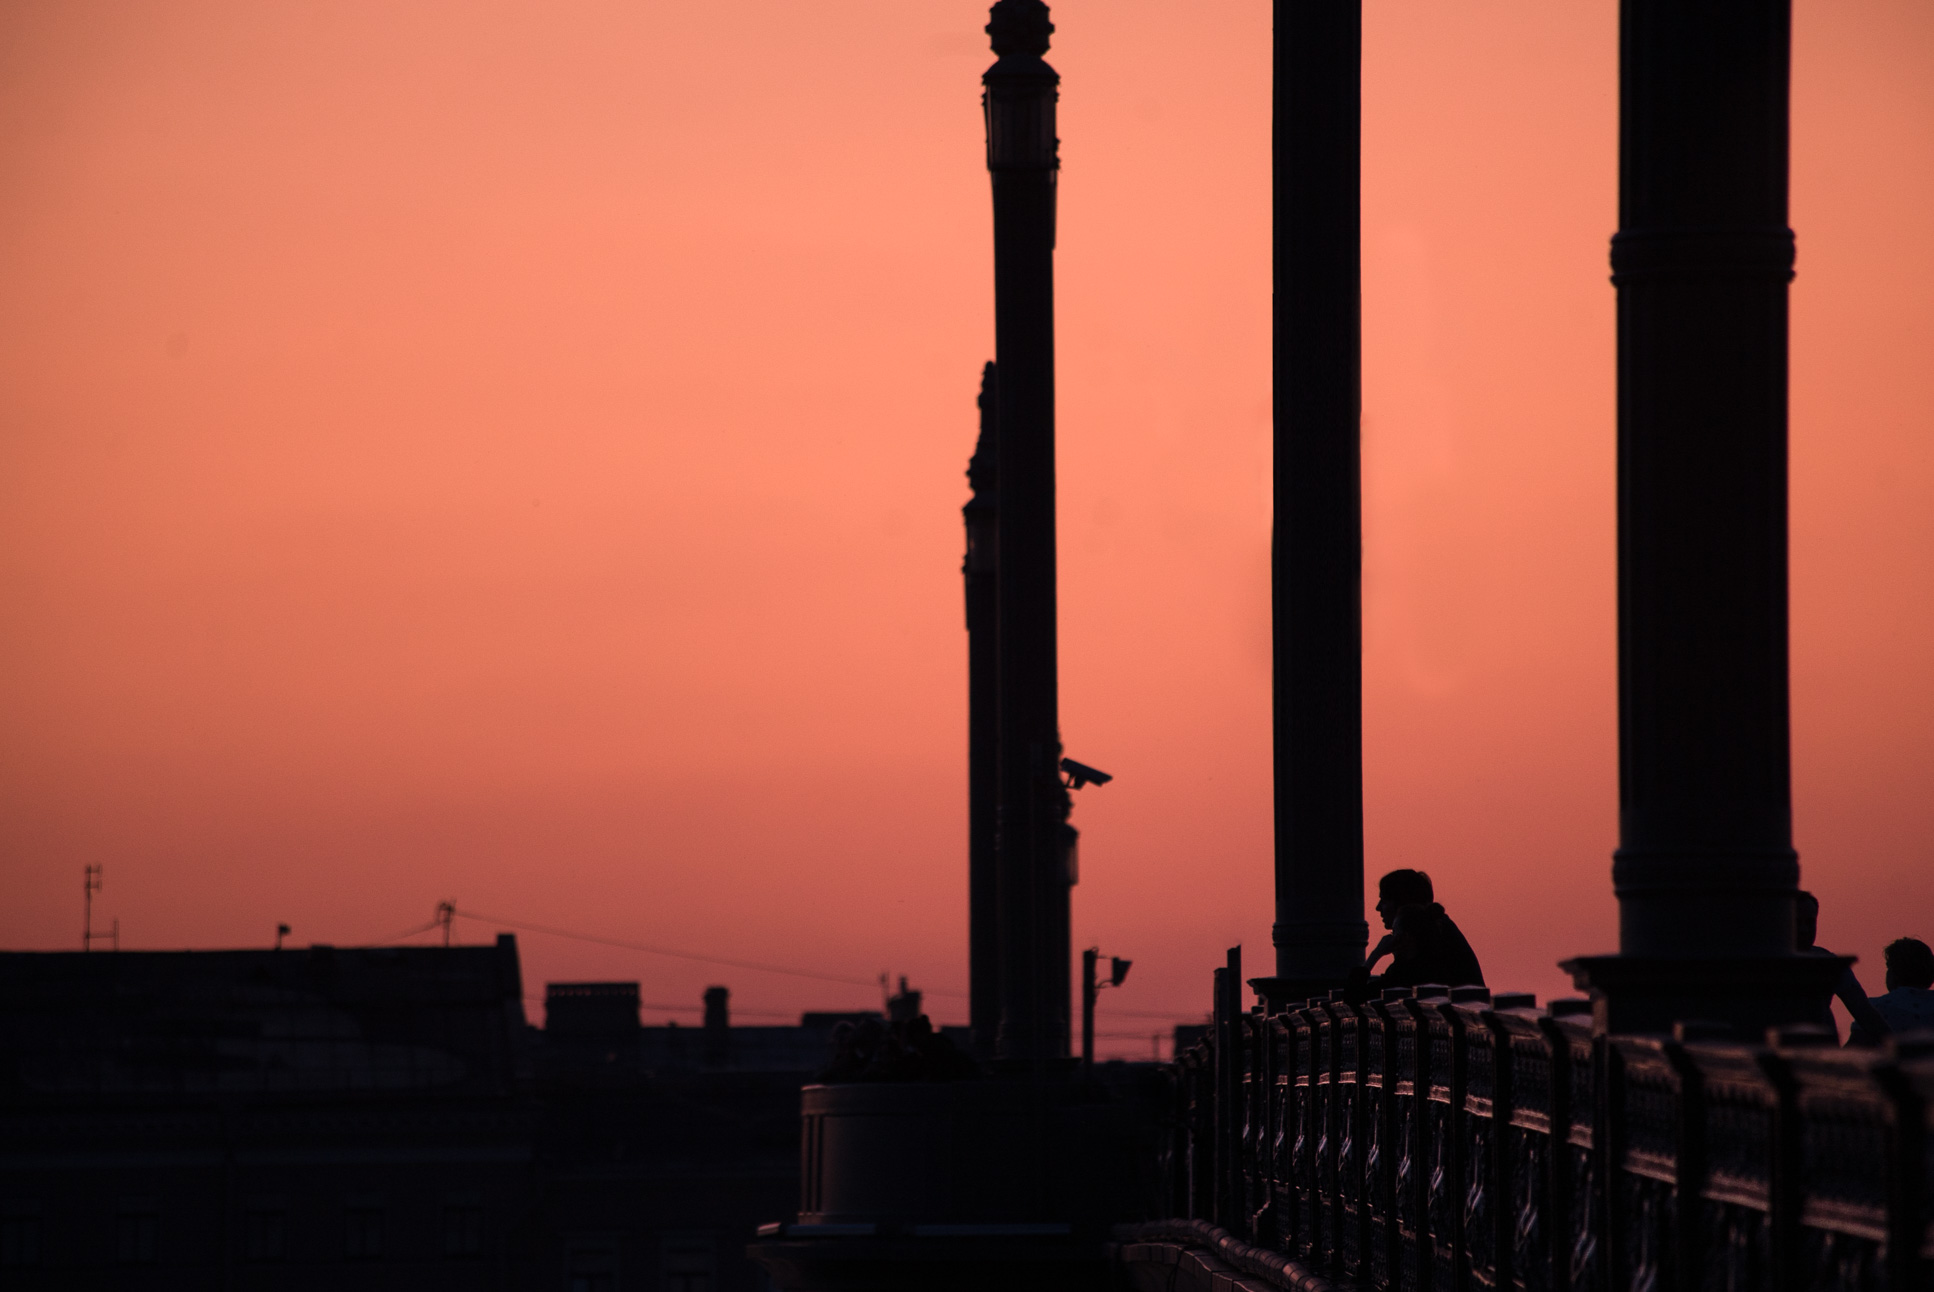 Sunset over the Palace Bridge